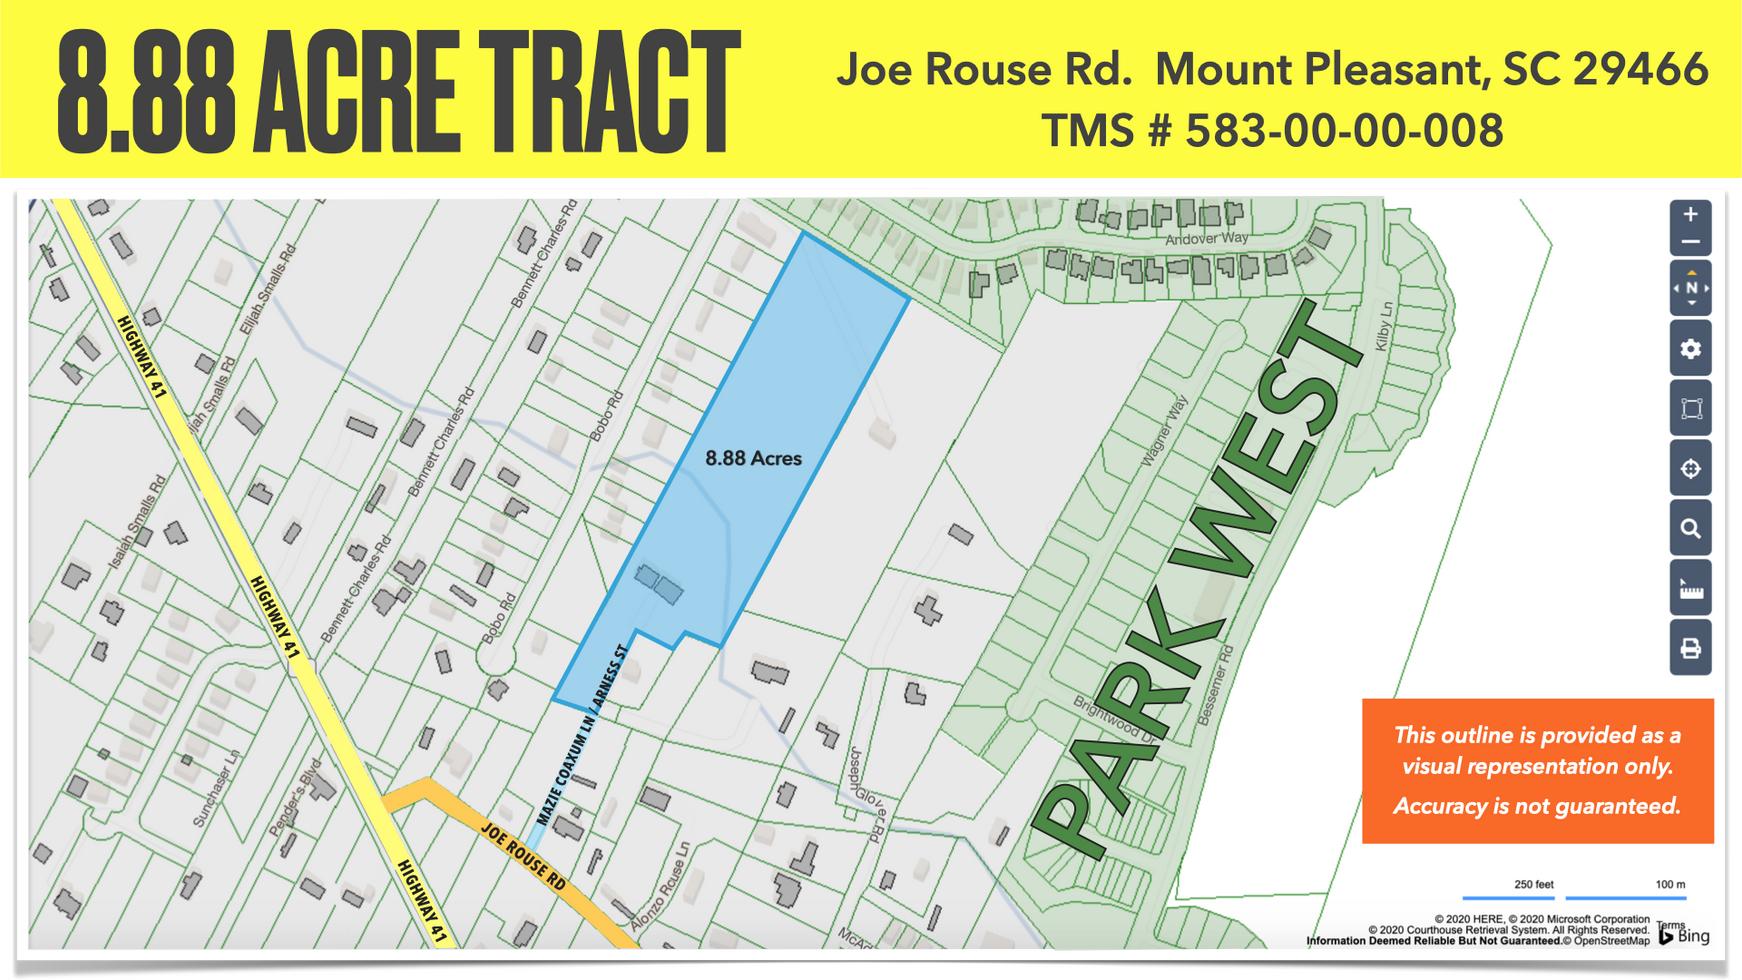 Joe Rouse Property Analysis .001.png